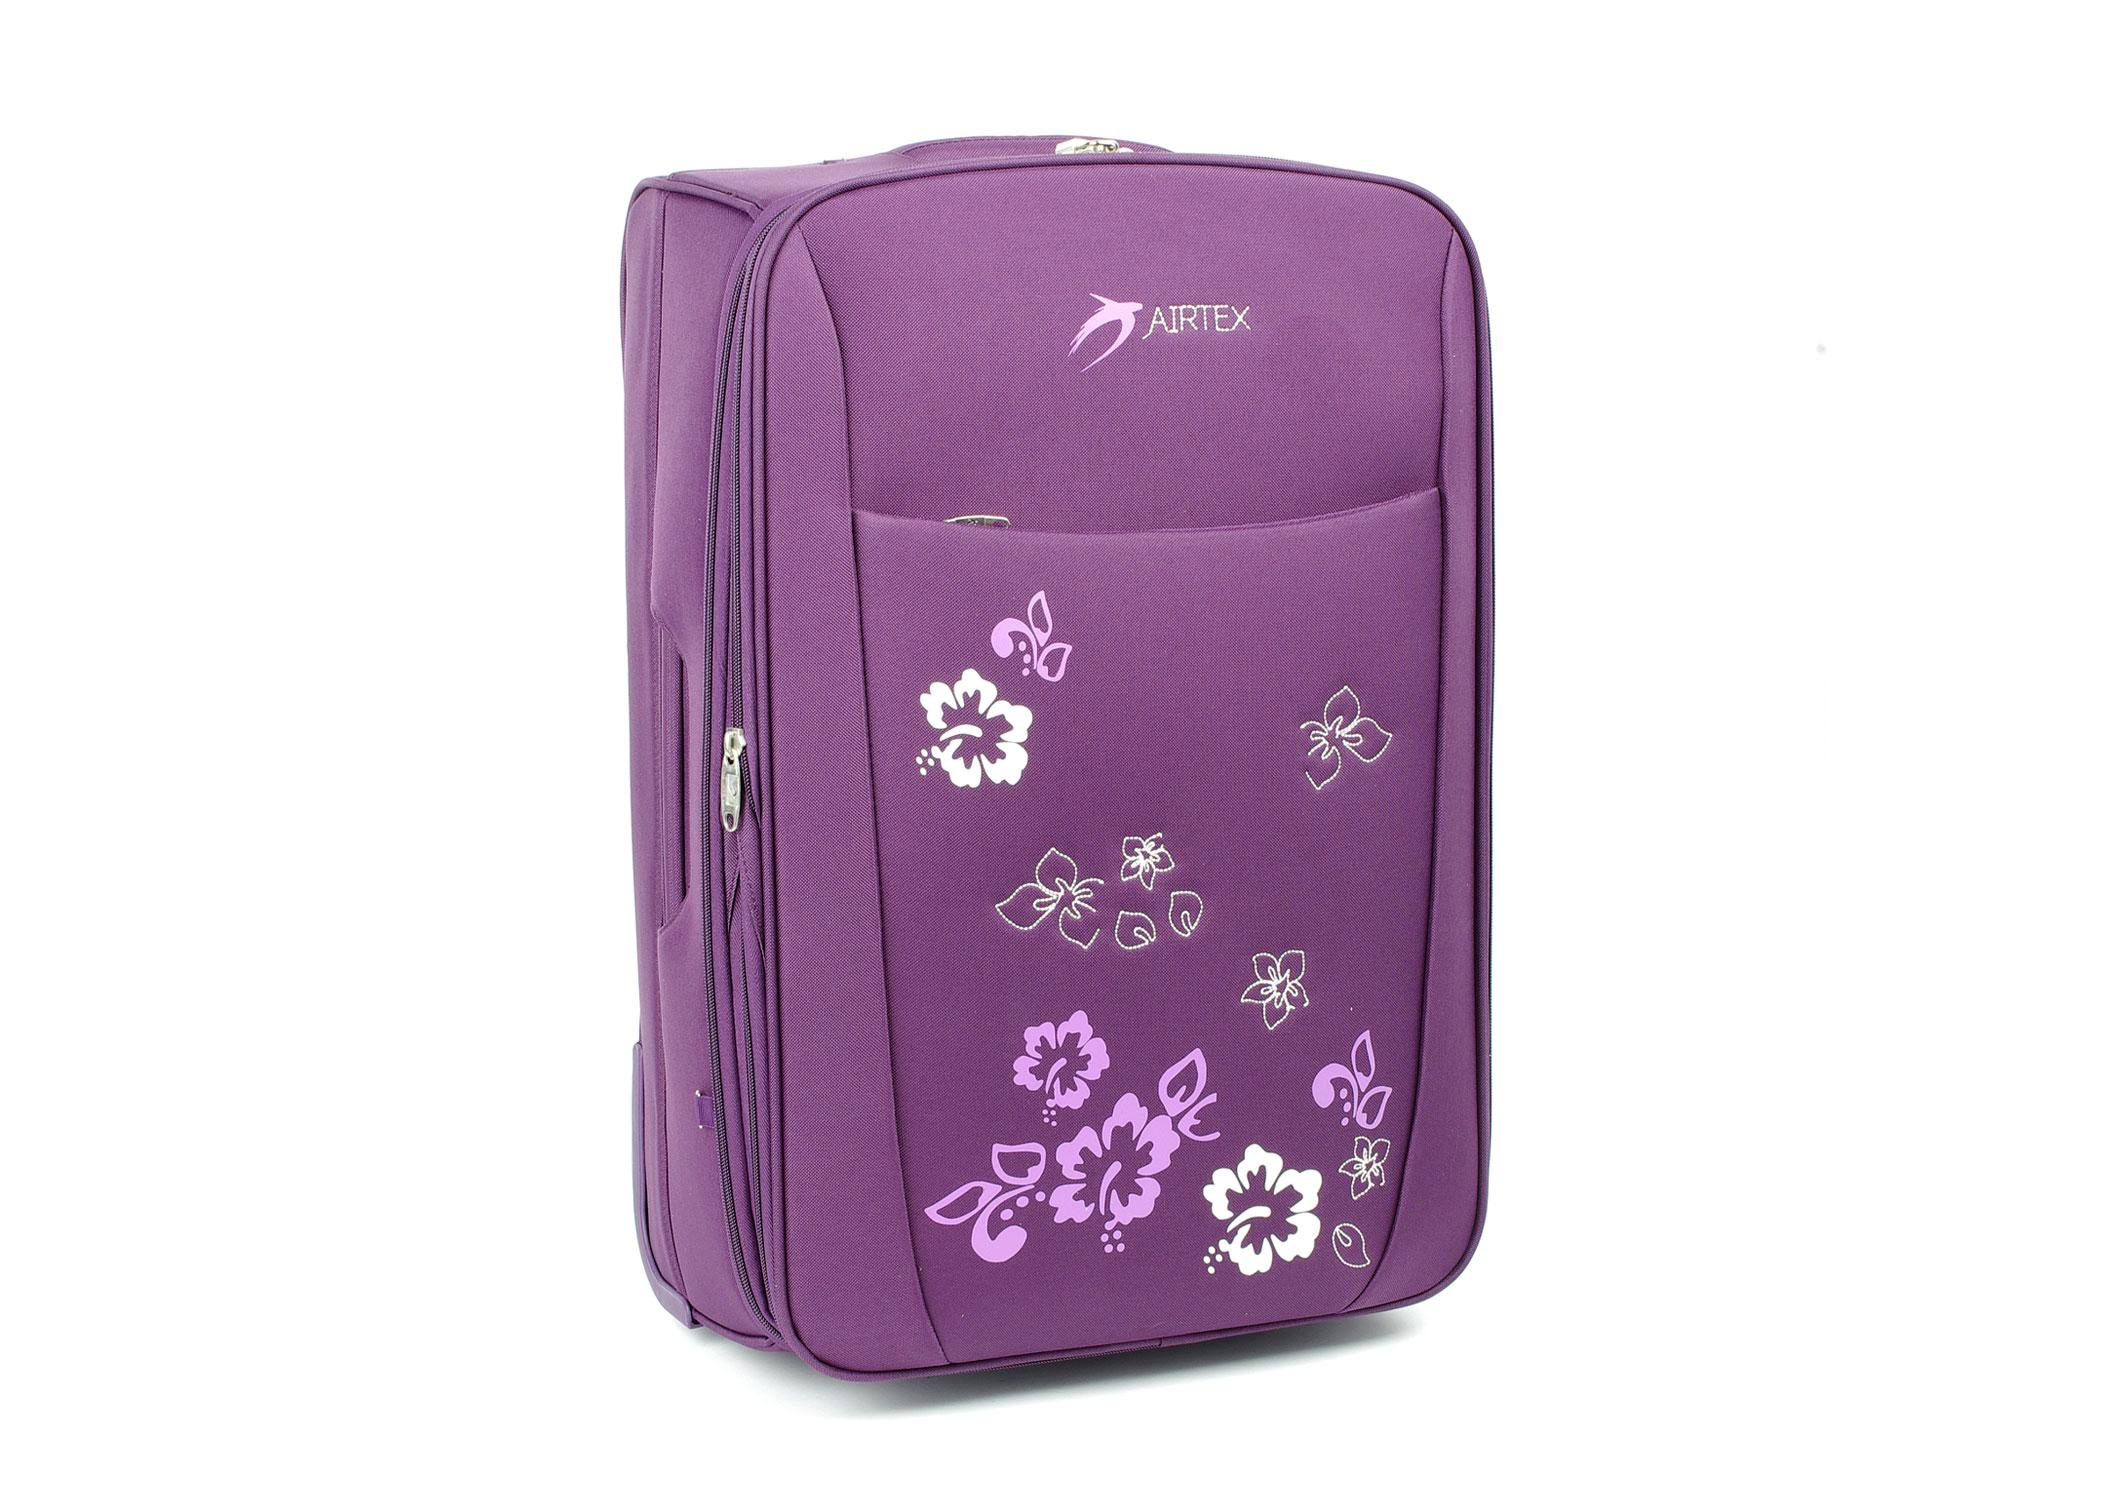 ca2f2cb8636eb Duża walizka podróżna na kółkach lekka Airtex 9154 - 6896932997 ...